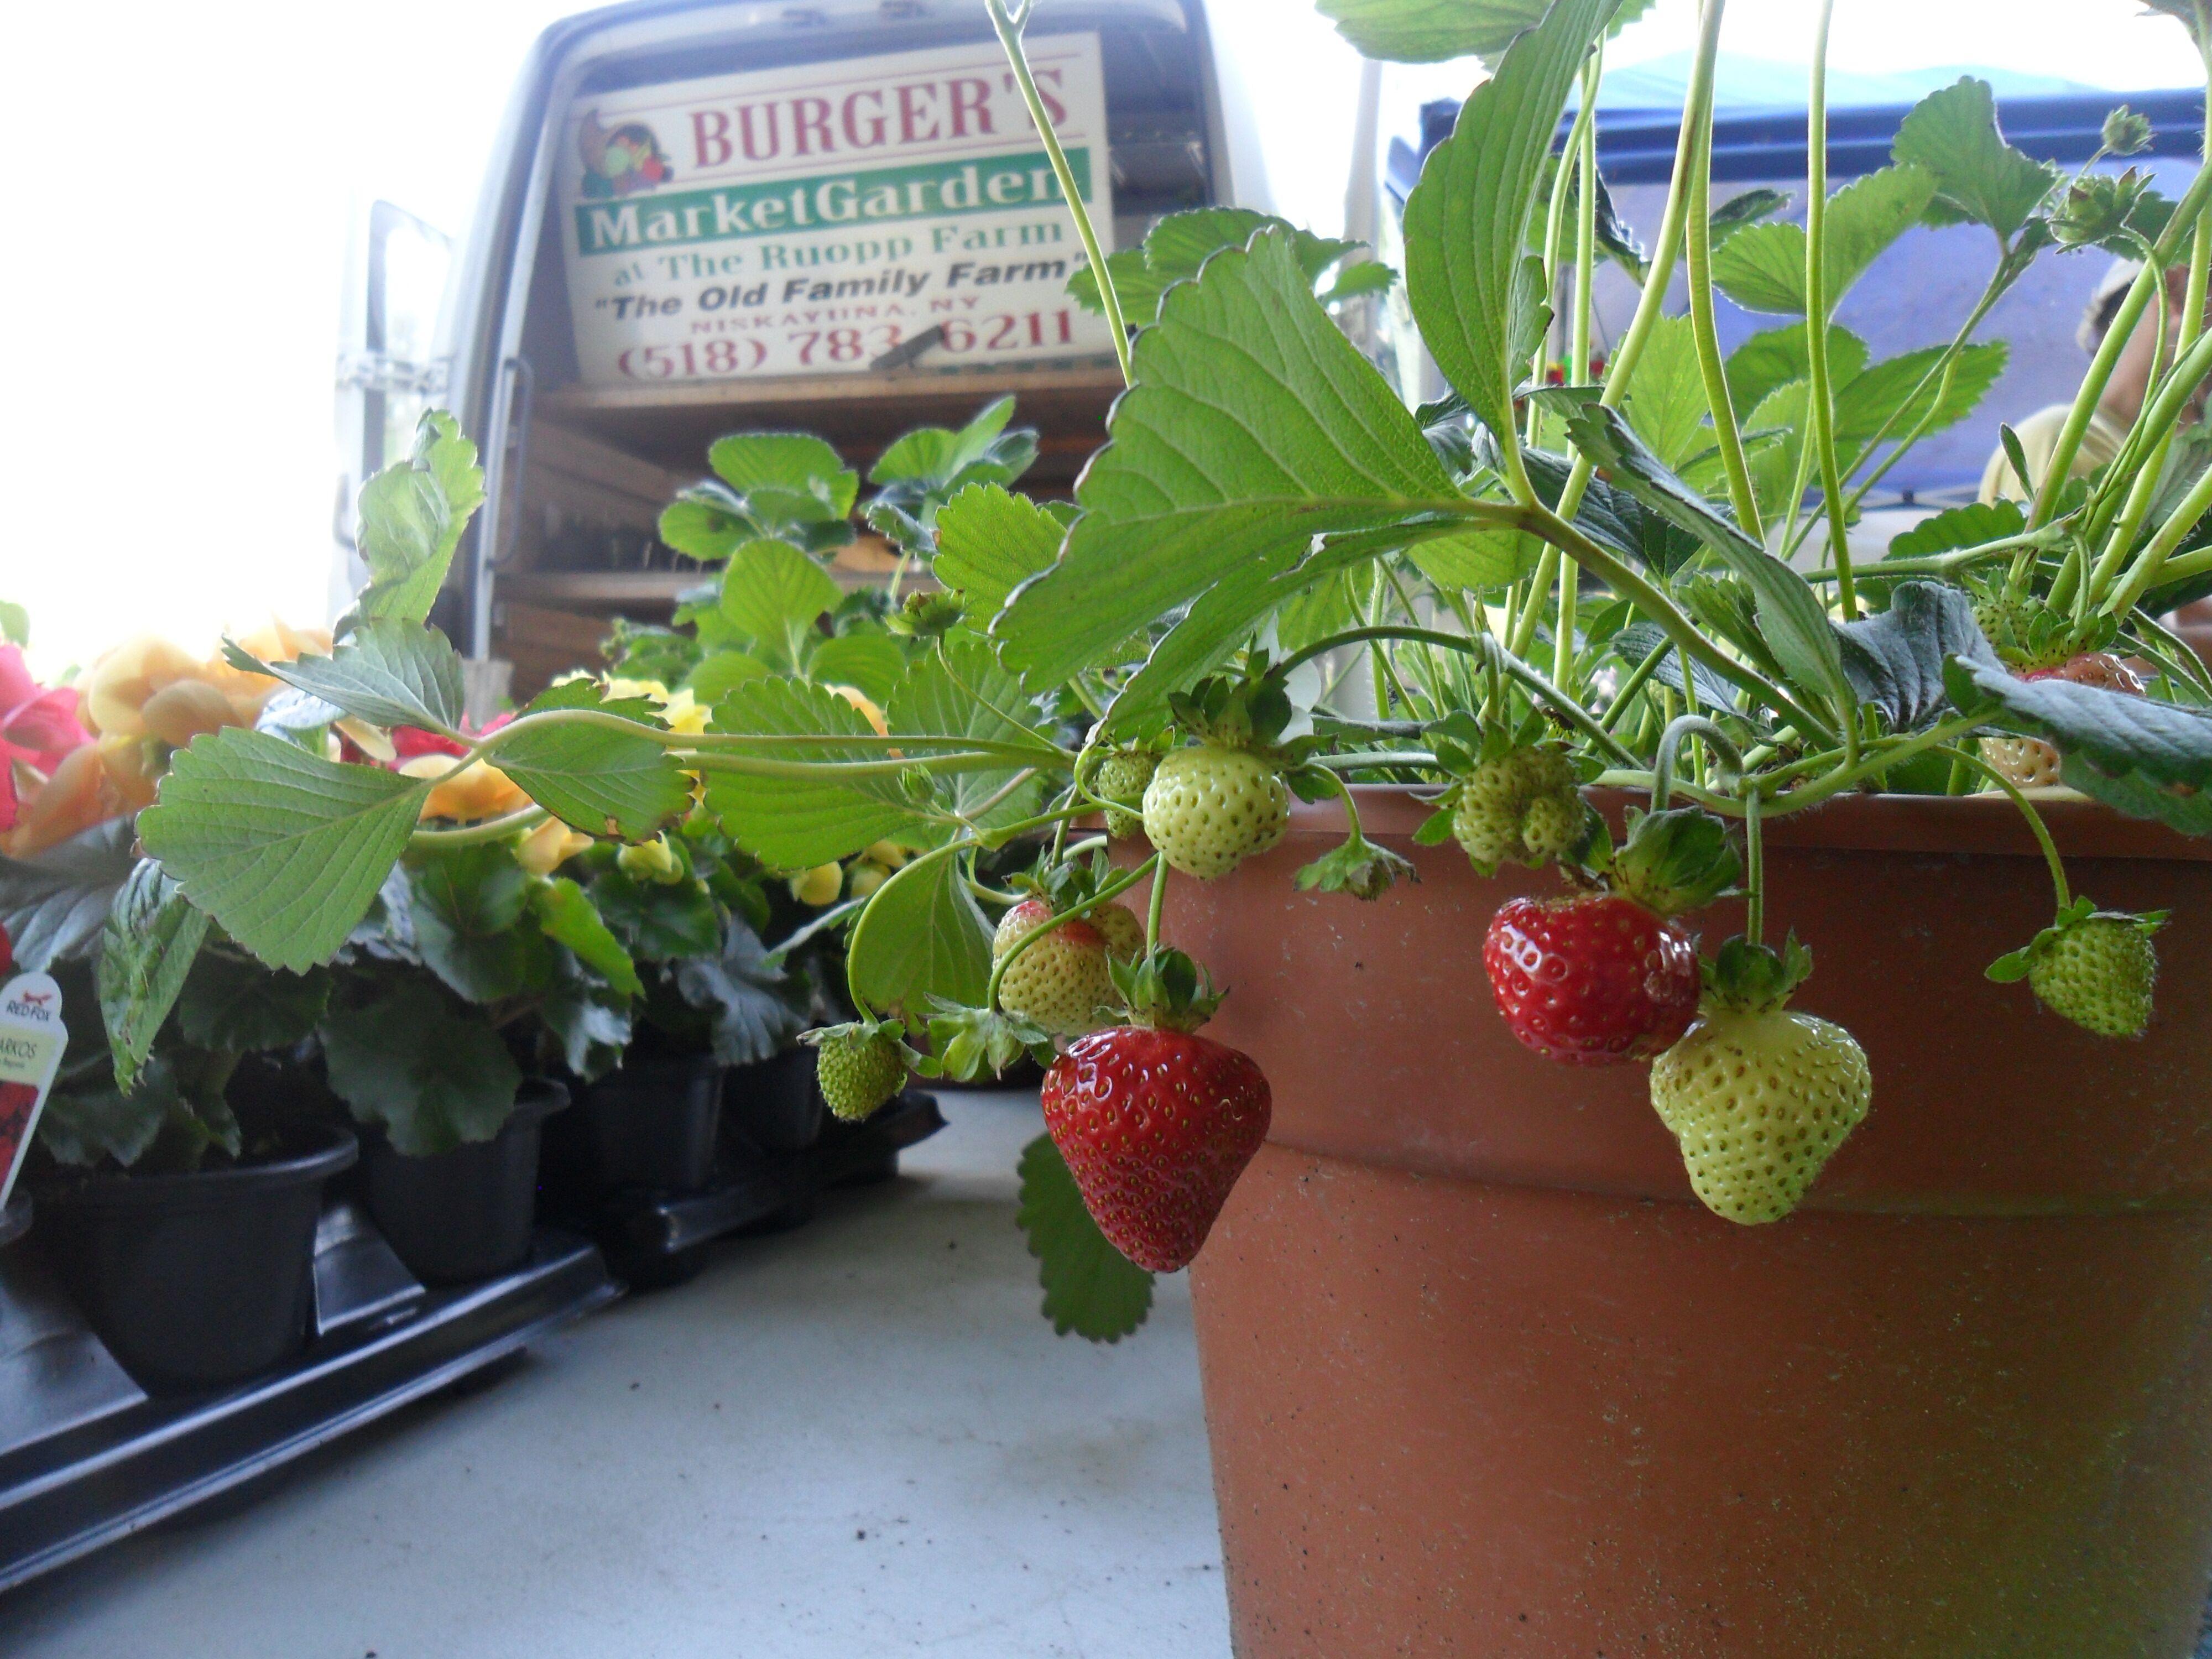 Saratoga Farmers' Market - Burger Farm